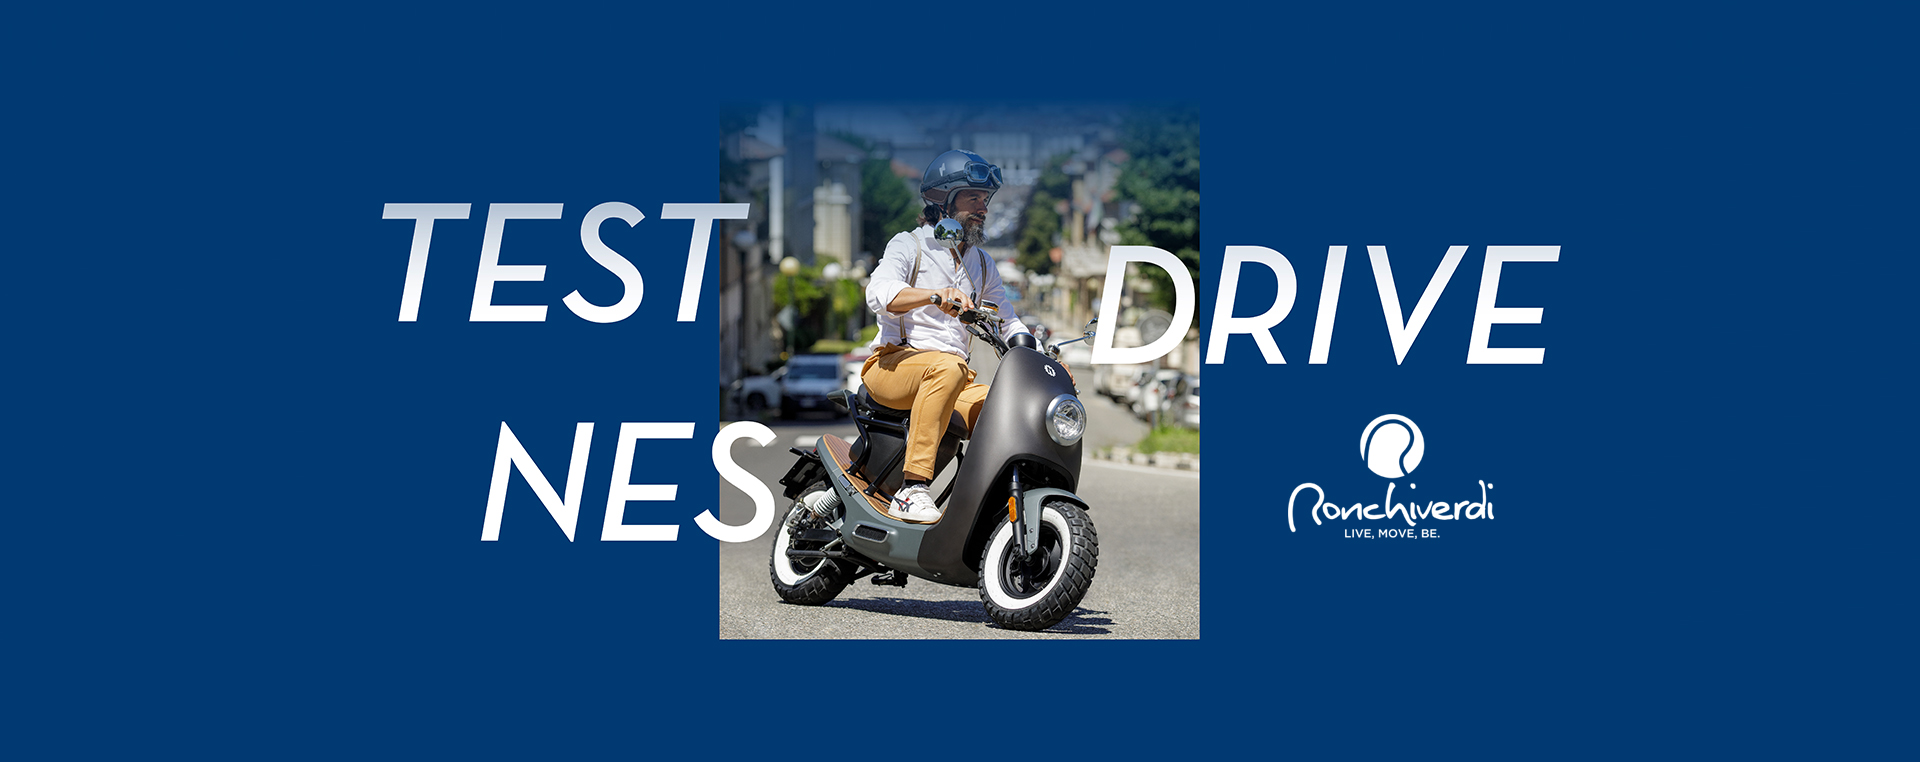 test drive ronchi seconda pagina news (1)